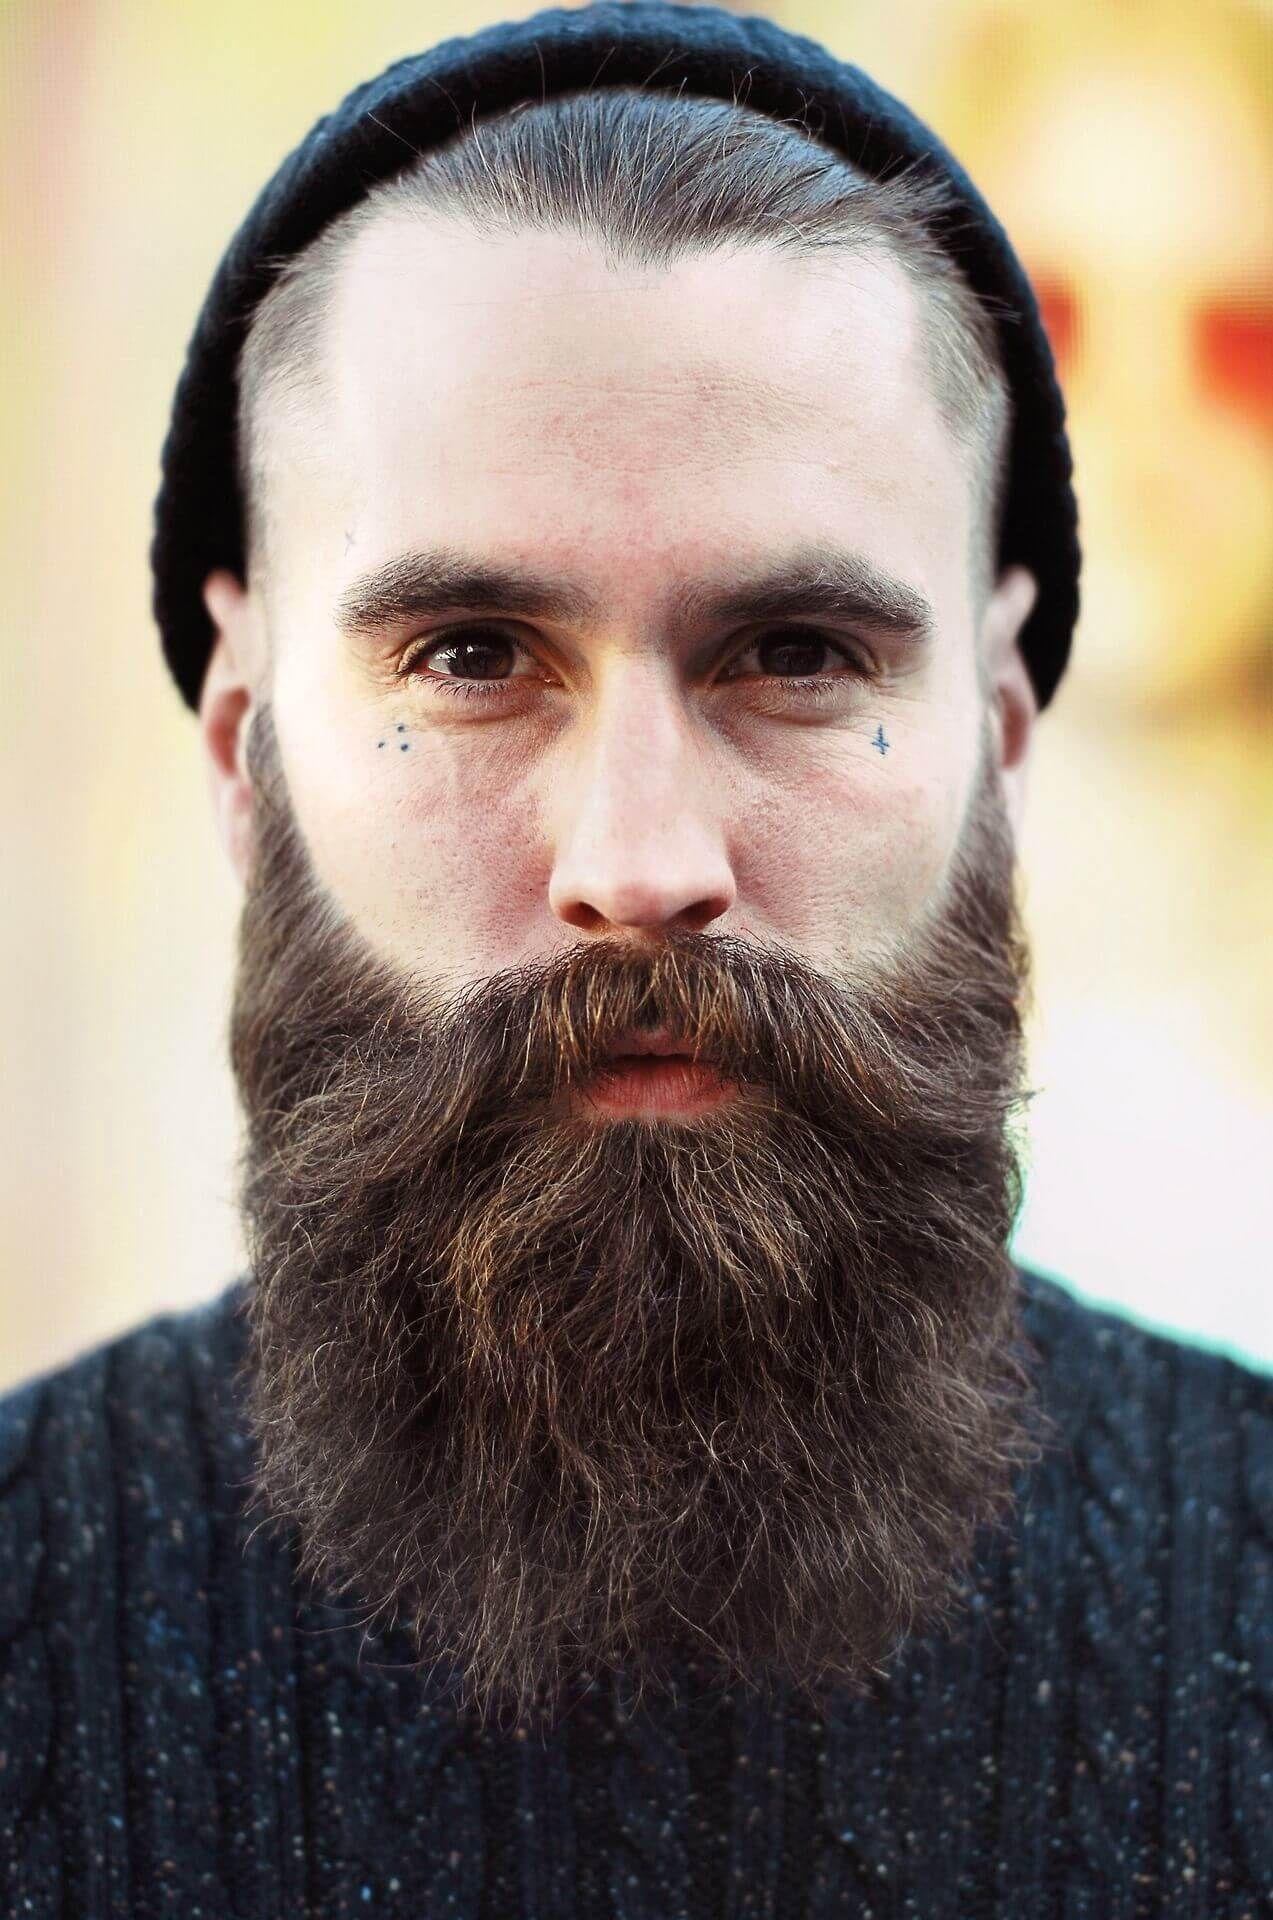 бородатые русские мужчины фото штанах